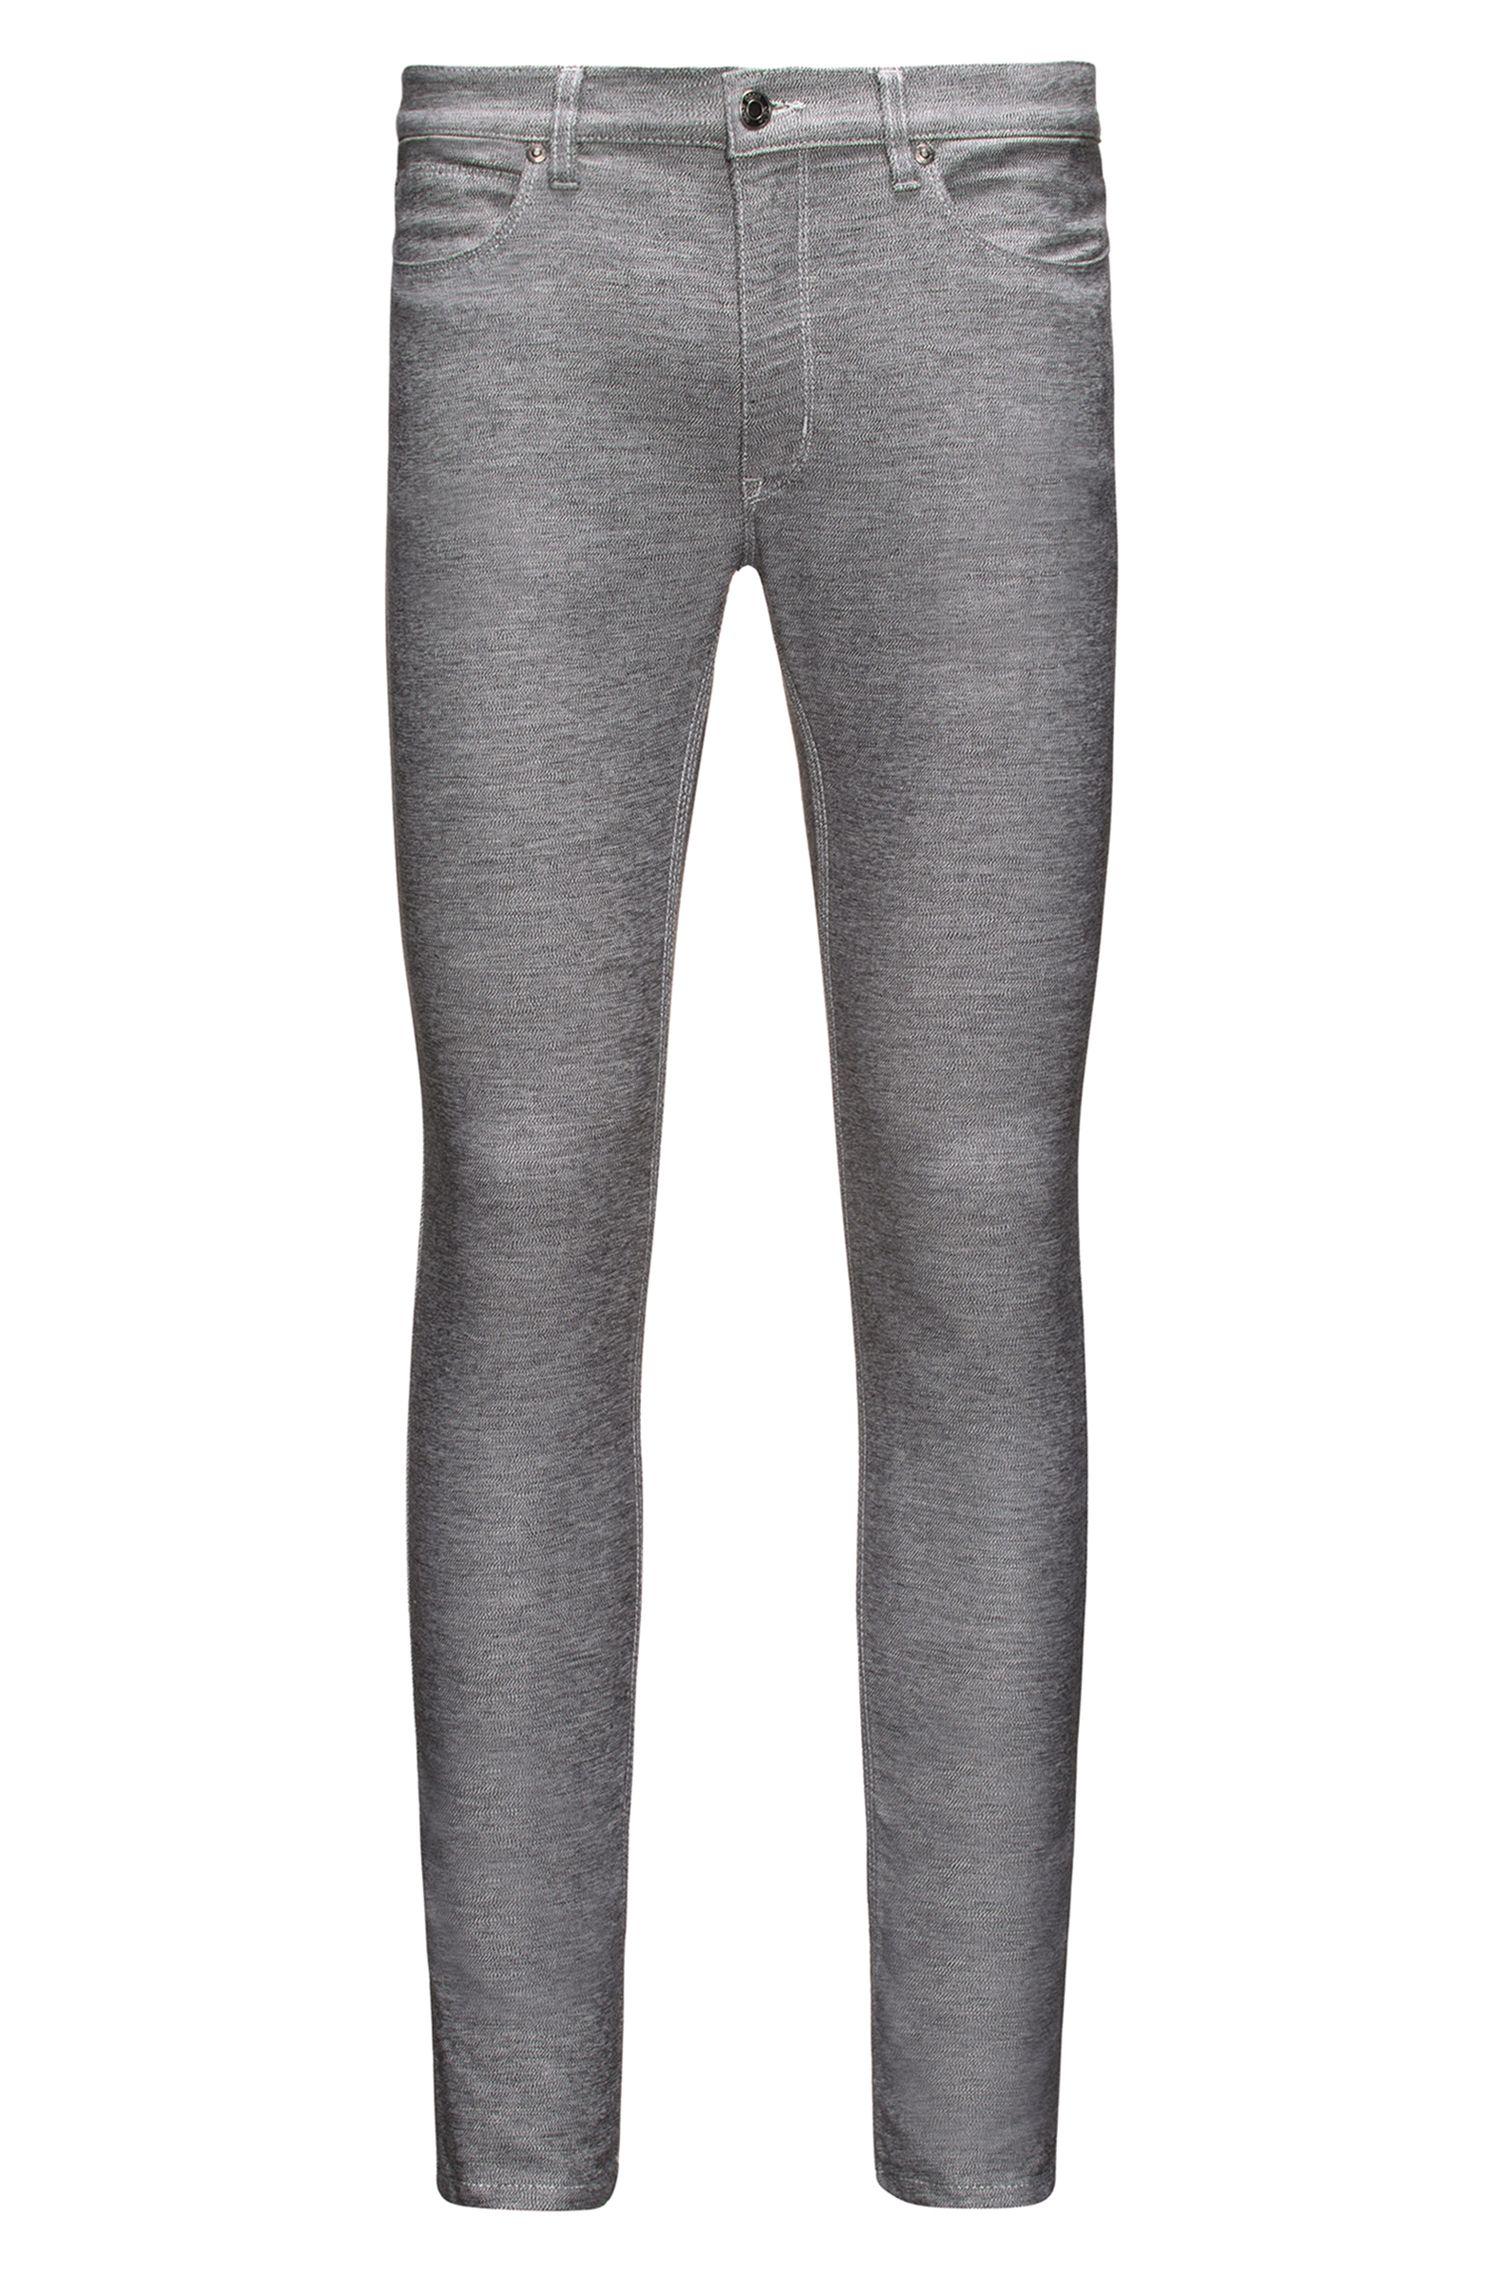 Skinny-fit jeans in dark-grey stretch jersey